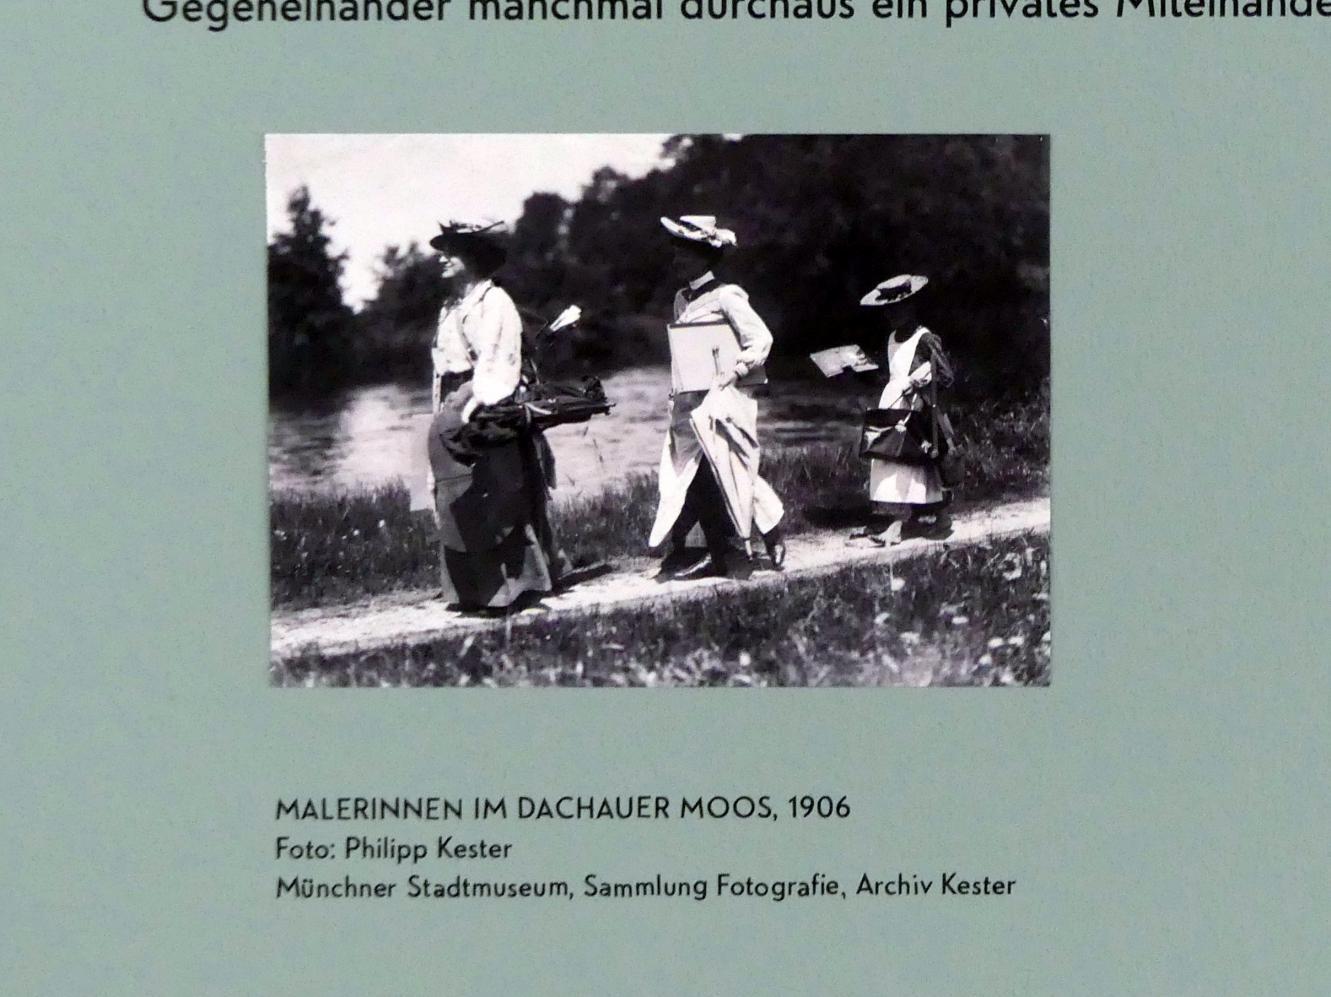 München, Lenbachhaus, Saal 24, Bild 6/14